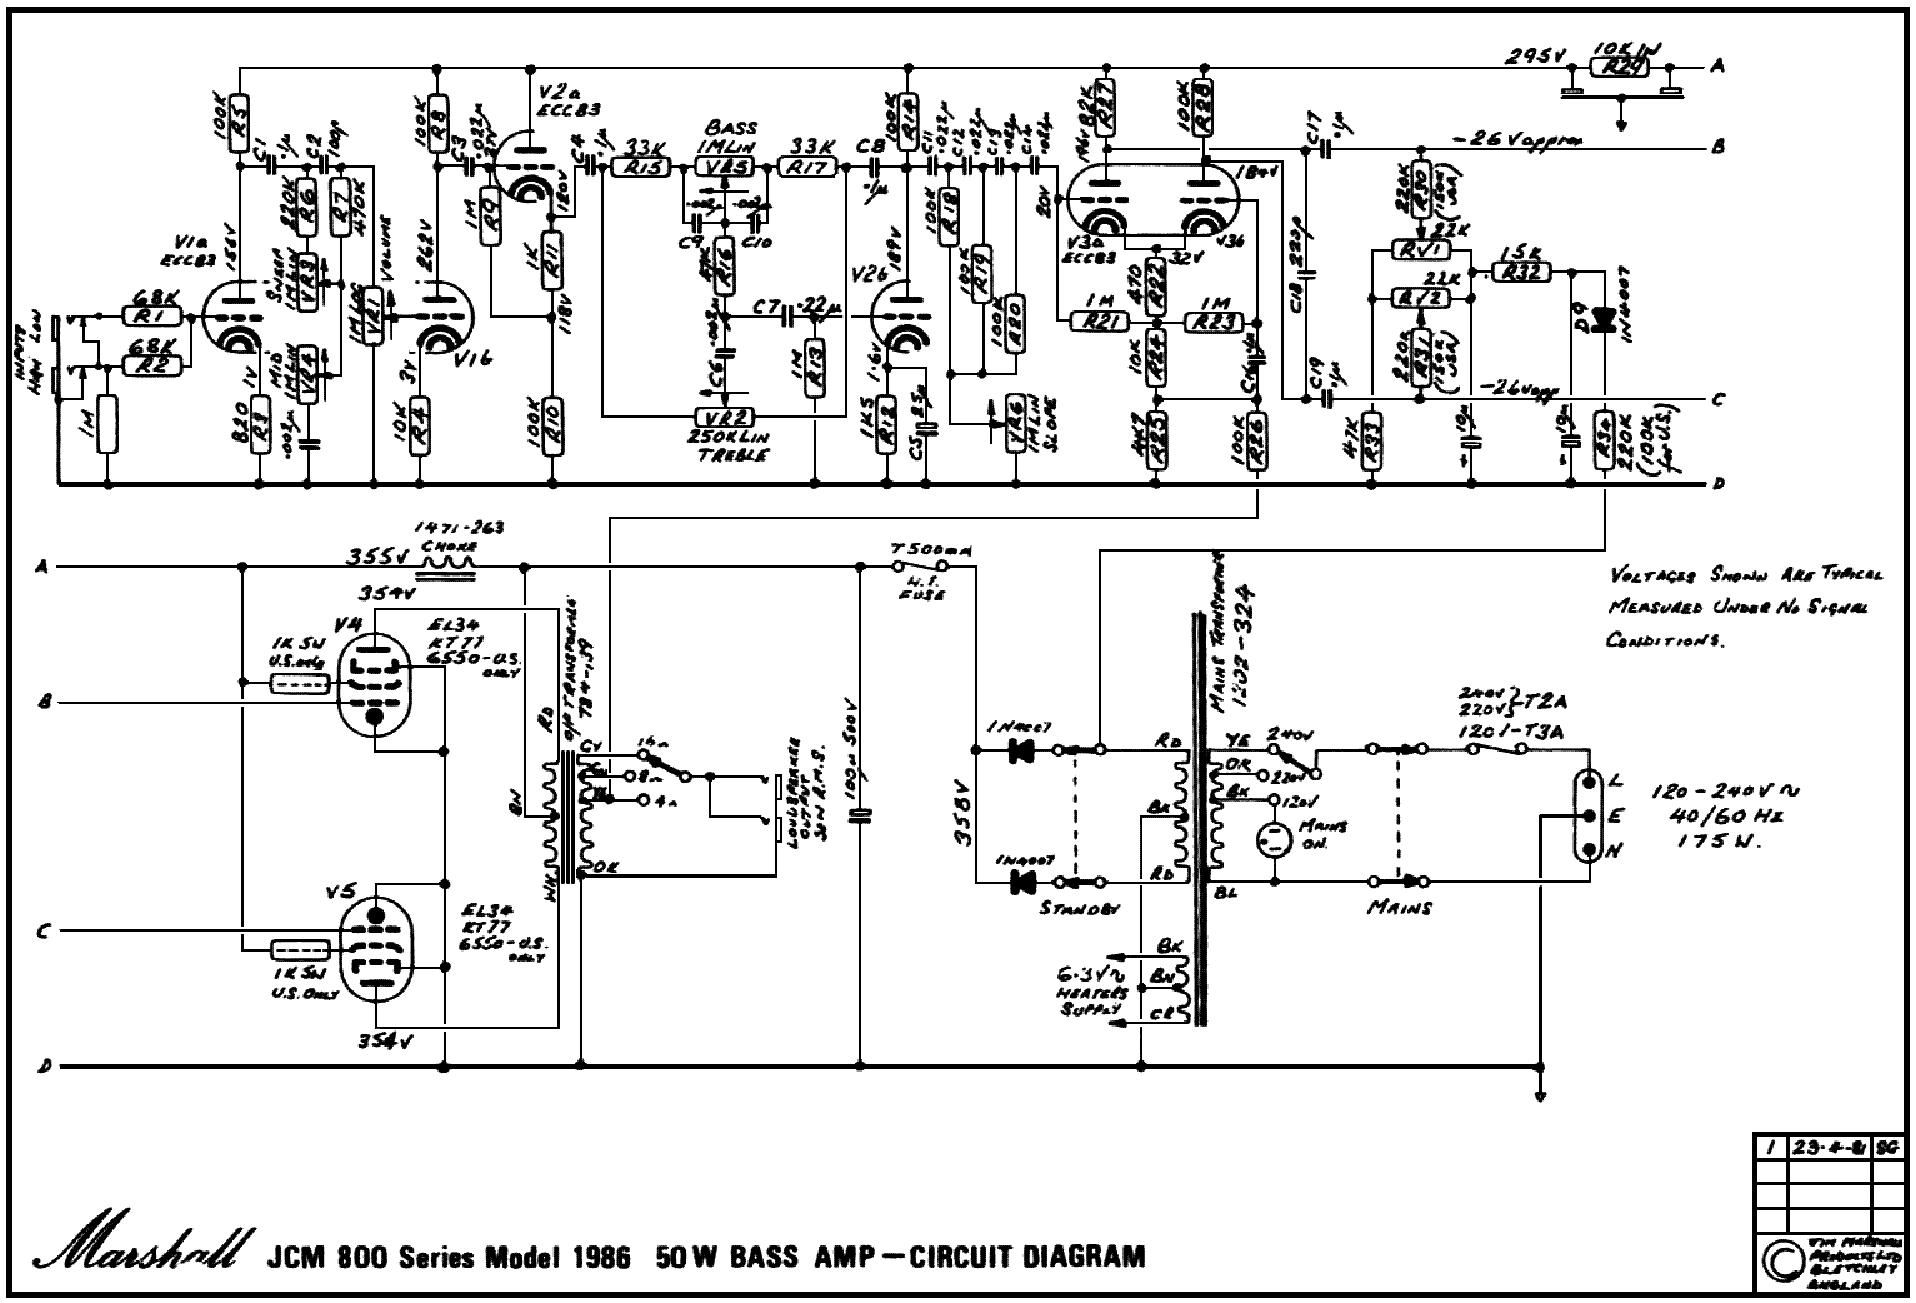 marshall_jcm800_bass_50w_1986.pdf_1.png